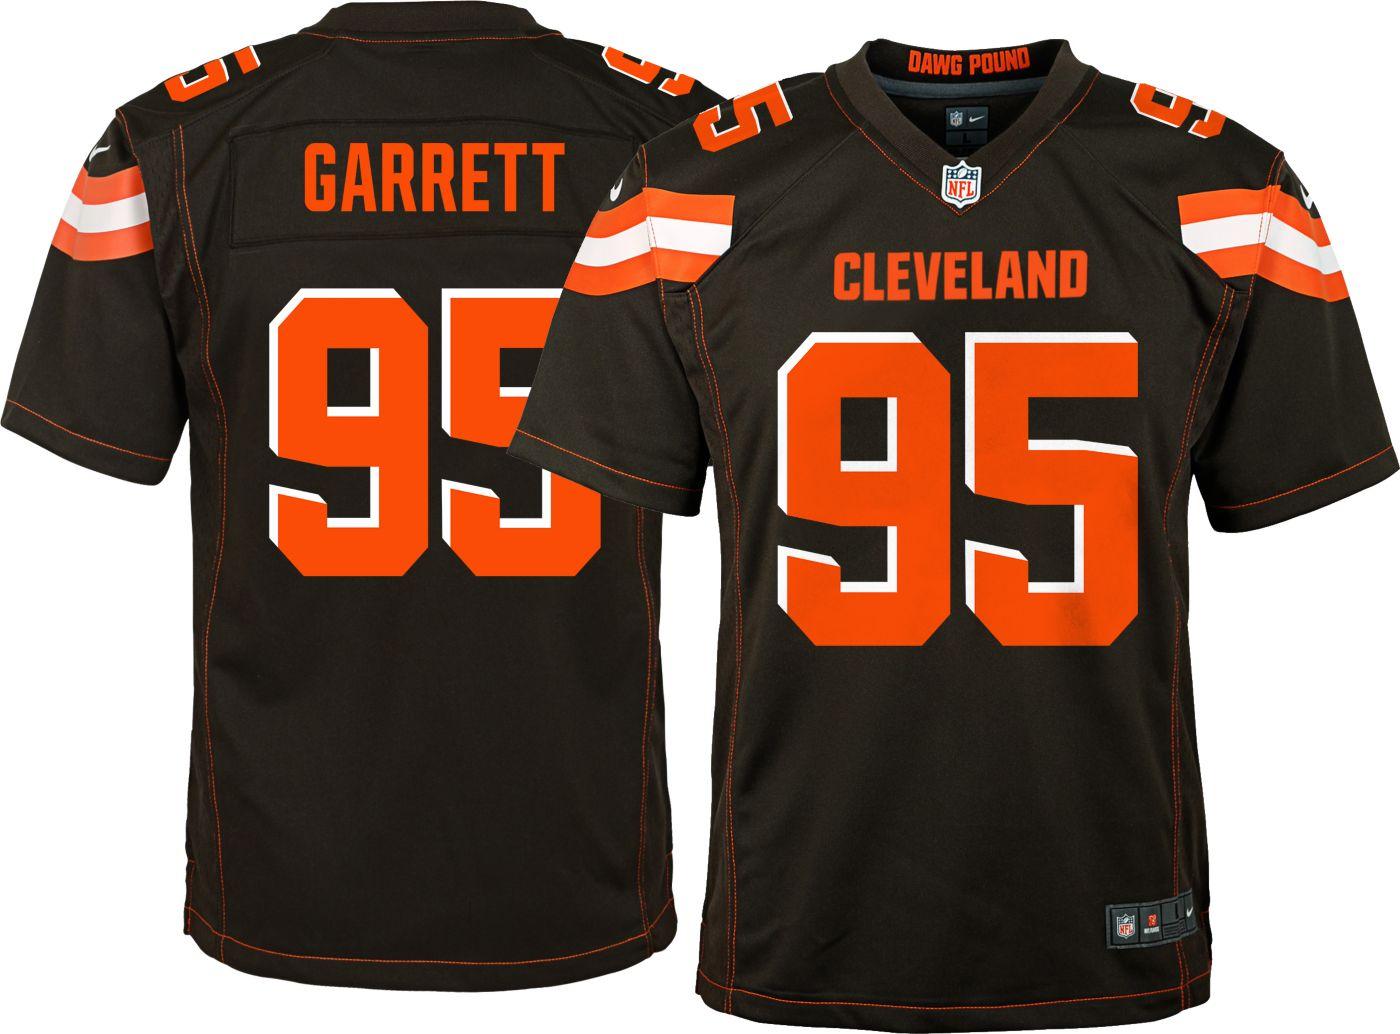 Nike Youth Home Game Jersey Cleveland Browns Myles Garrett #95